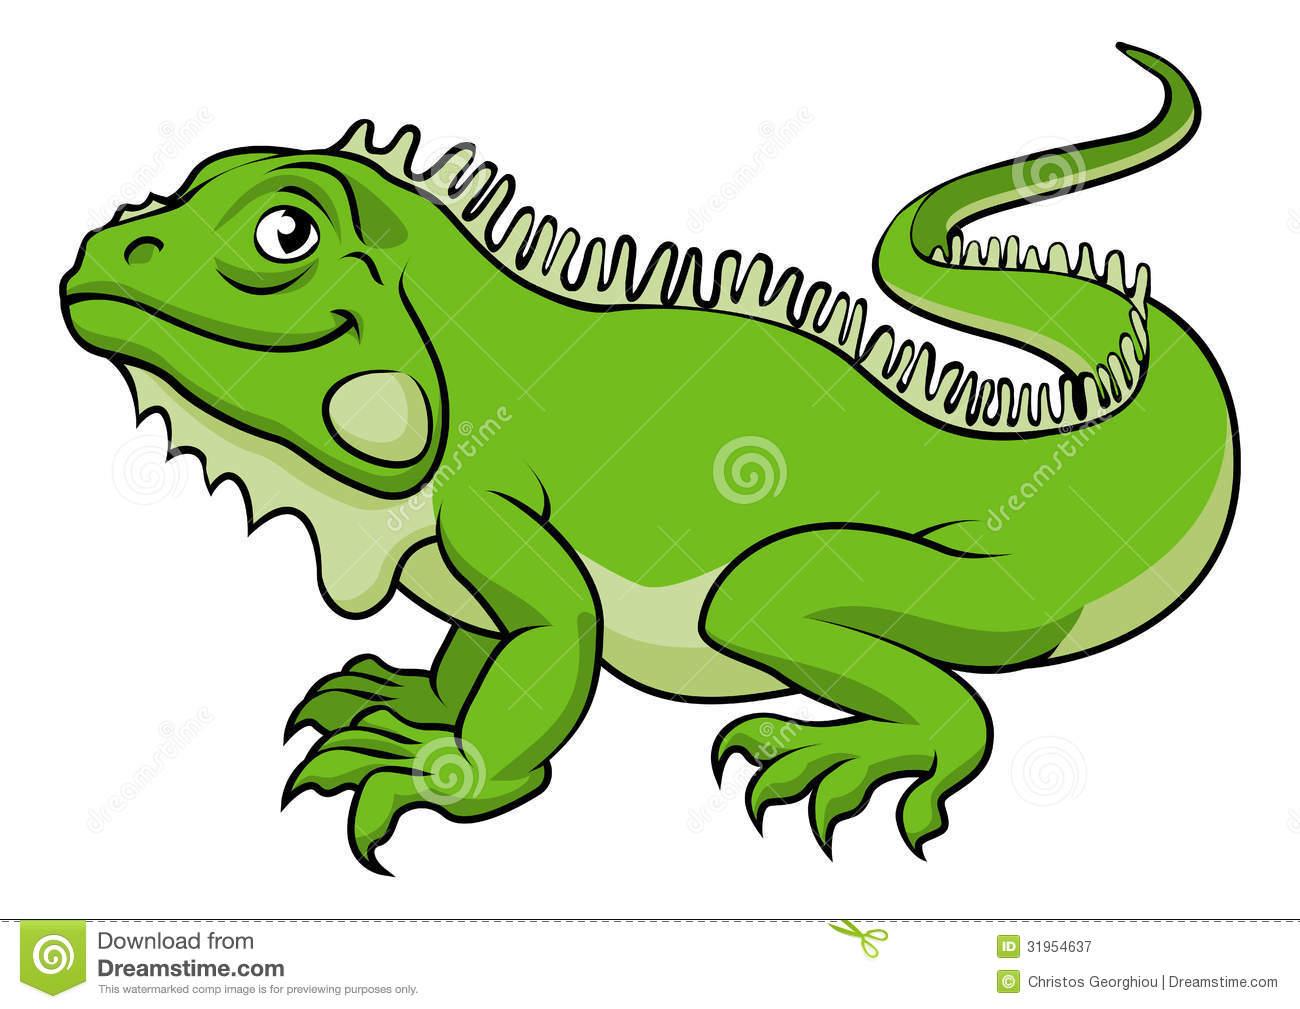 Green Iguana svg #17, Download drawings